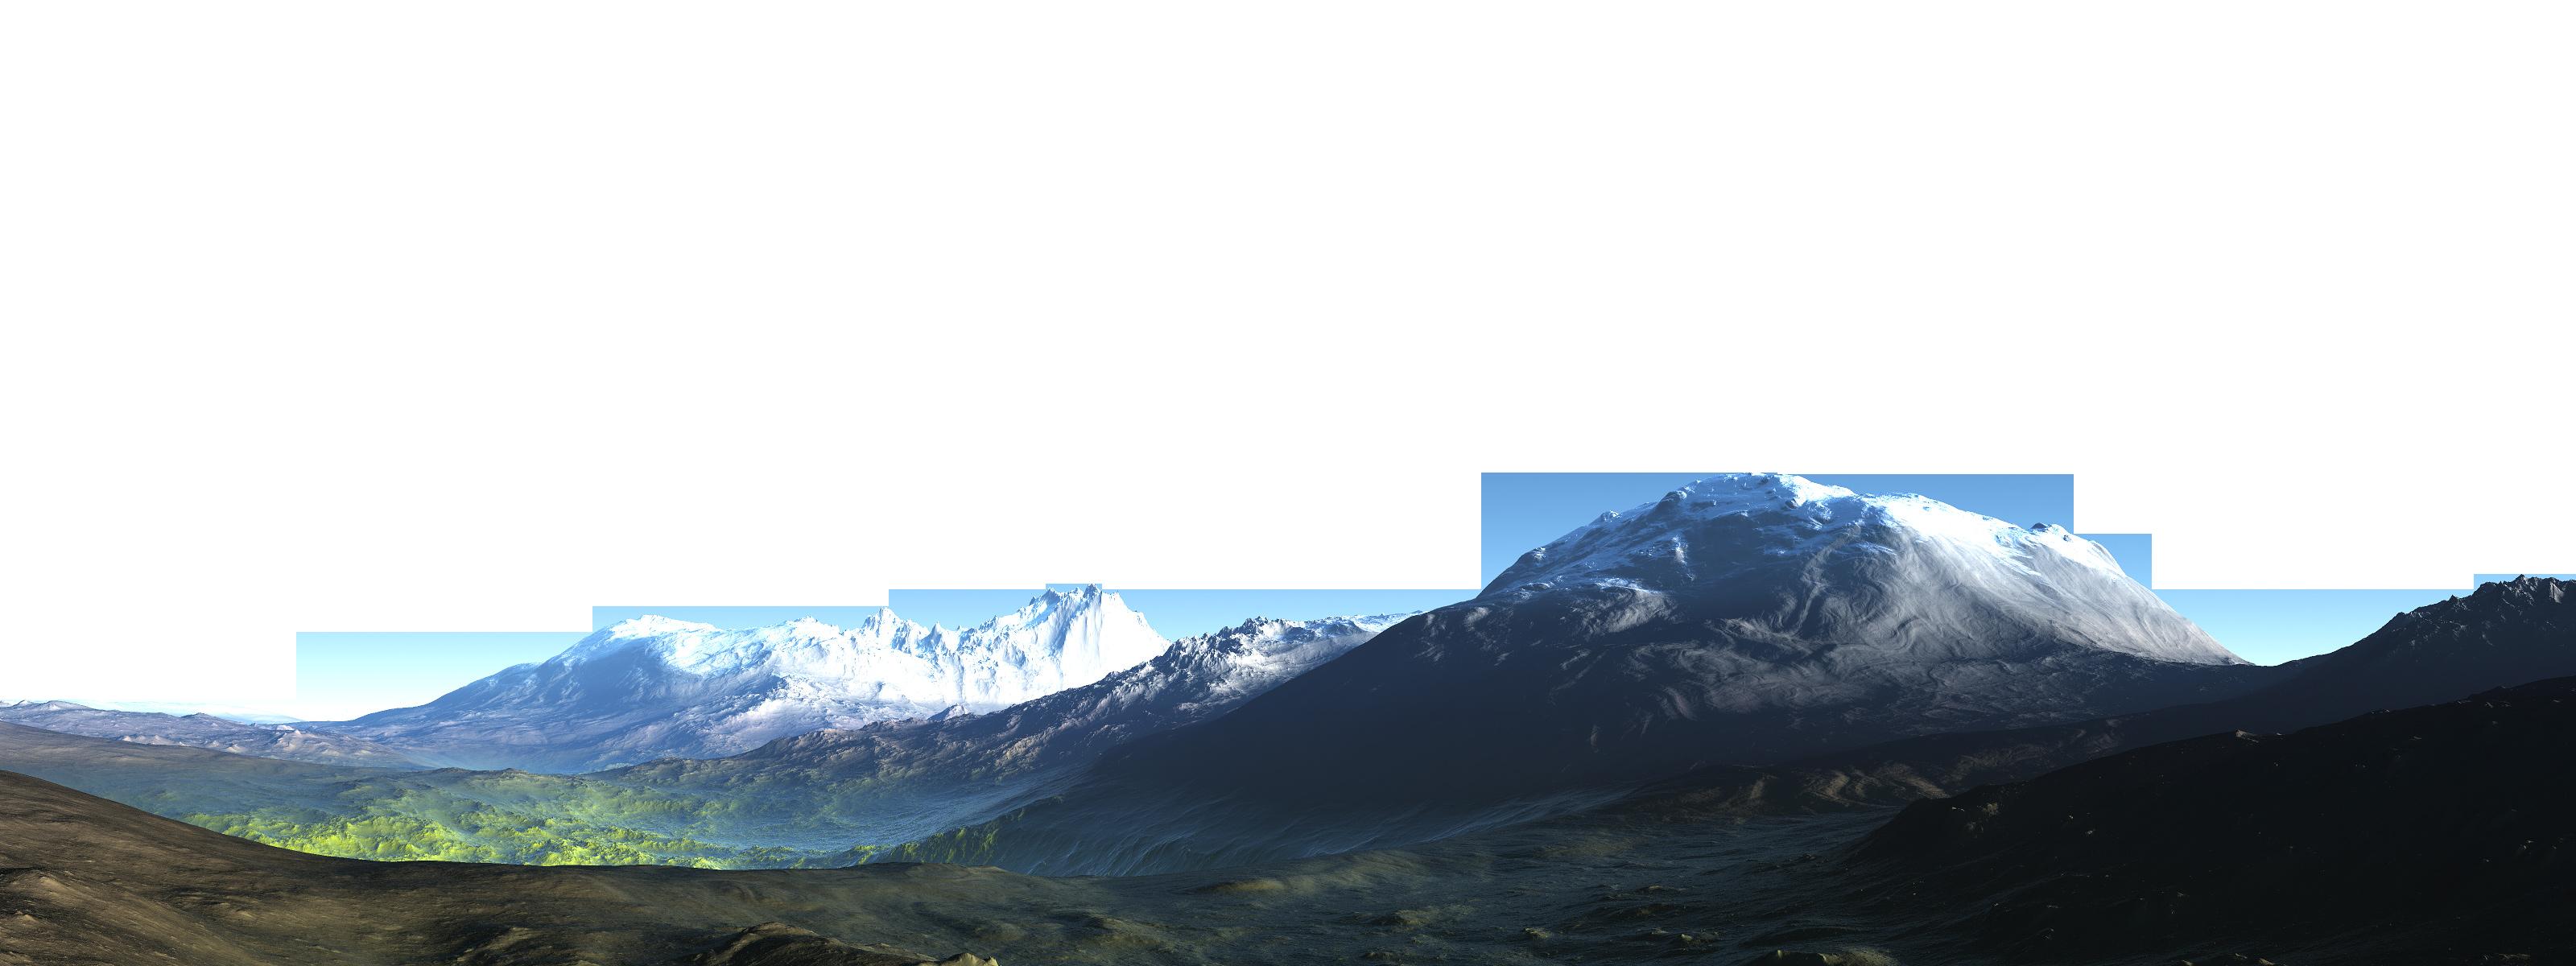 Sun rise over desert mountains clipart graphic download png transparent montaIN - Recherche Google | pNG MONTAGNE | Pinterest graphic download